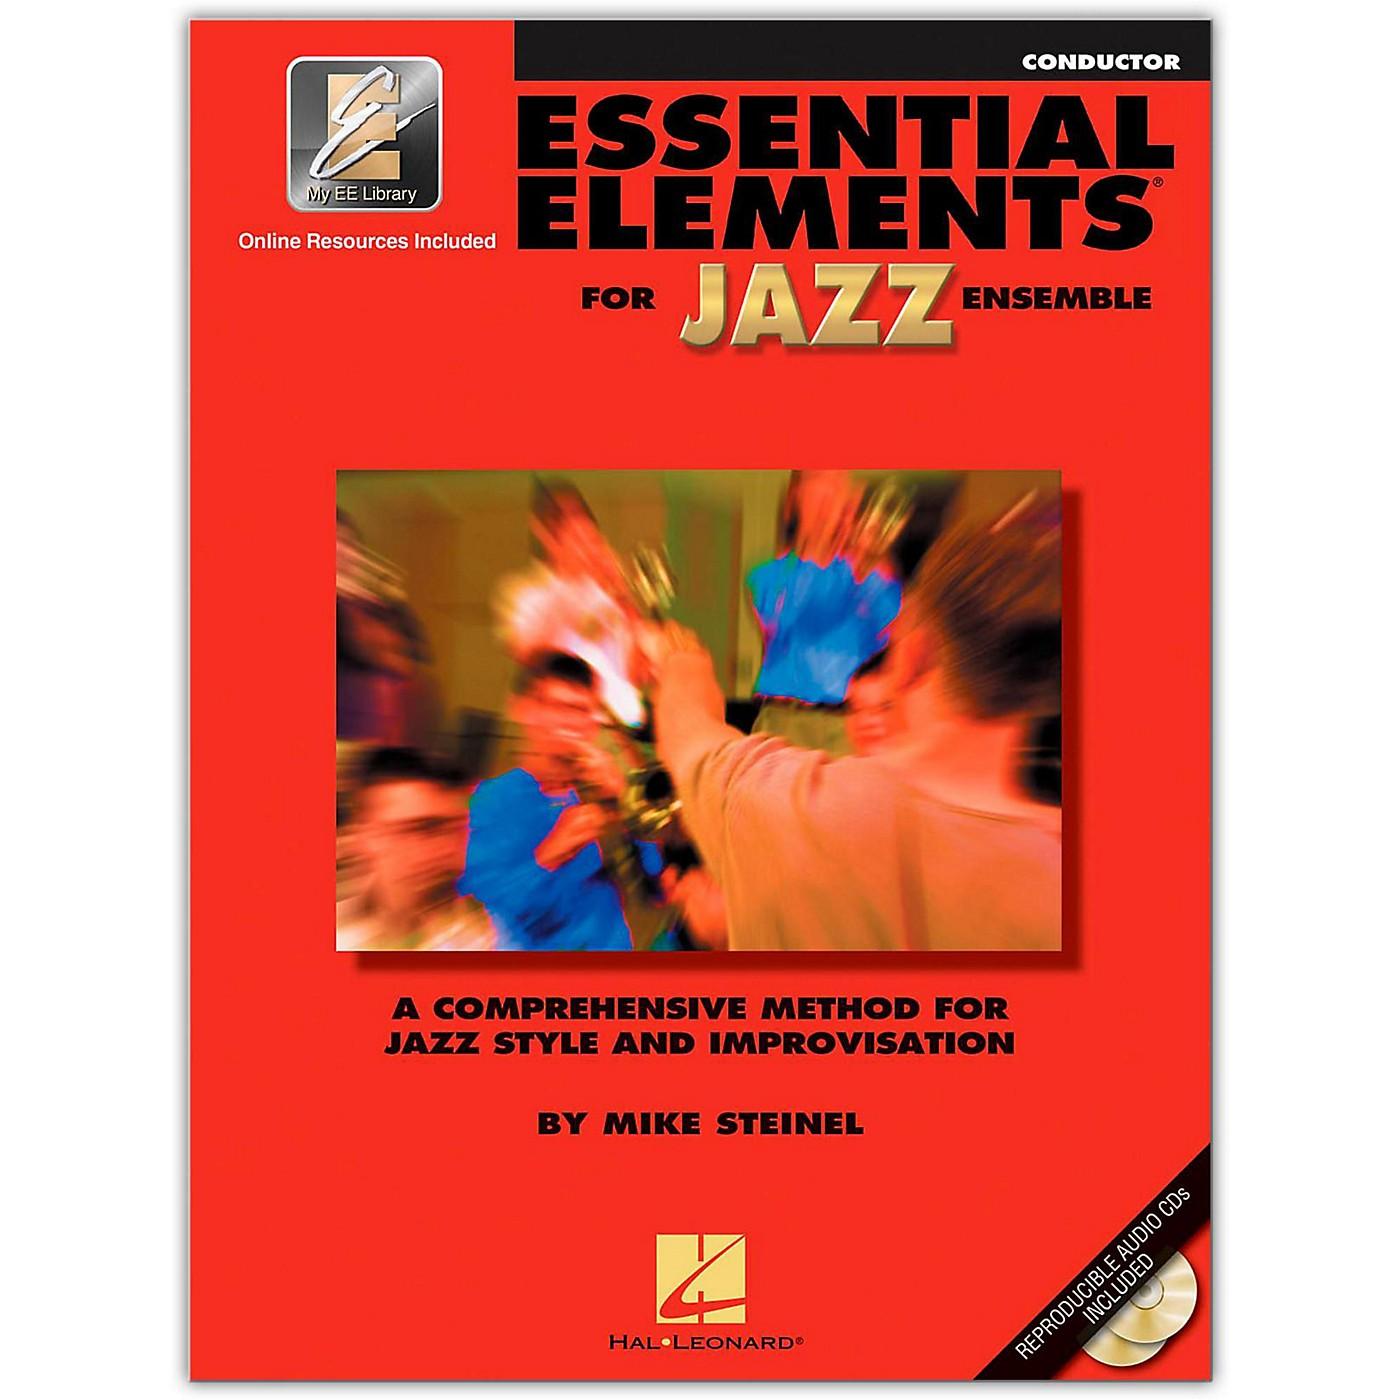 Hal Leonard Essential Elements for Jazz Ensemble - Conductor (Book/Online Audio) thumbnail